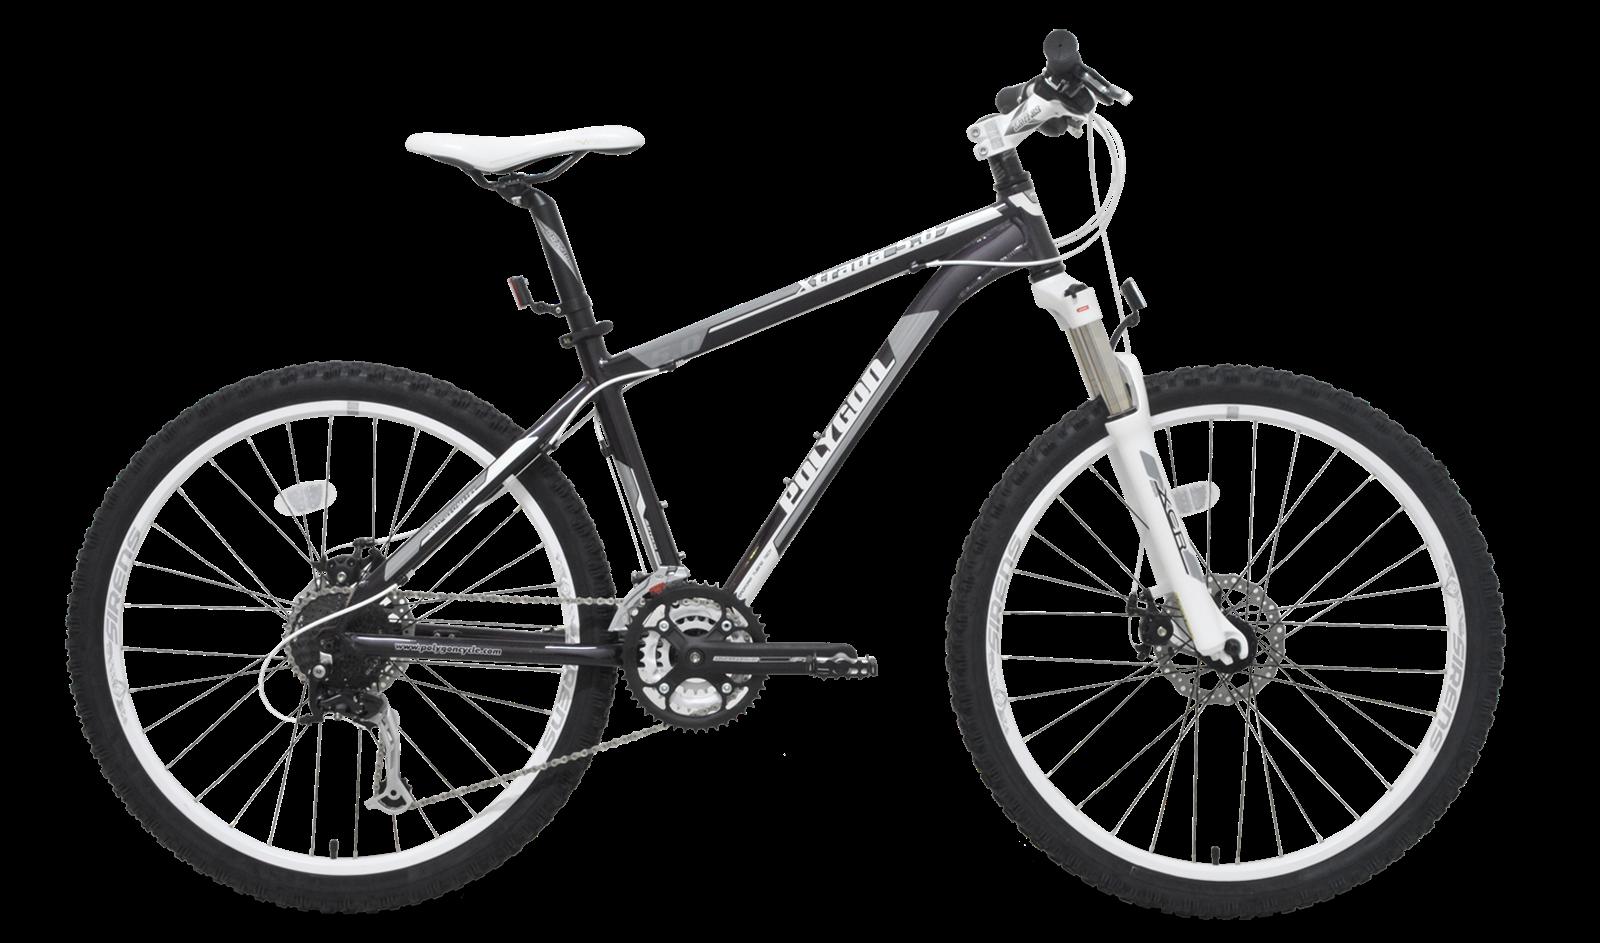 Ride My Bicycle POLYGON XTRADA 5.0 (2011 SERIES)